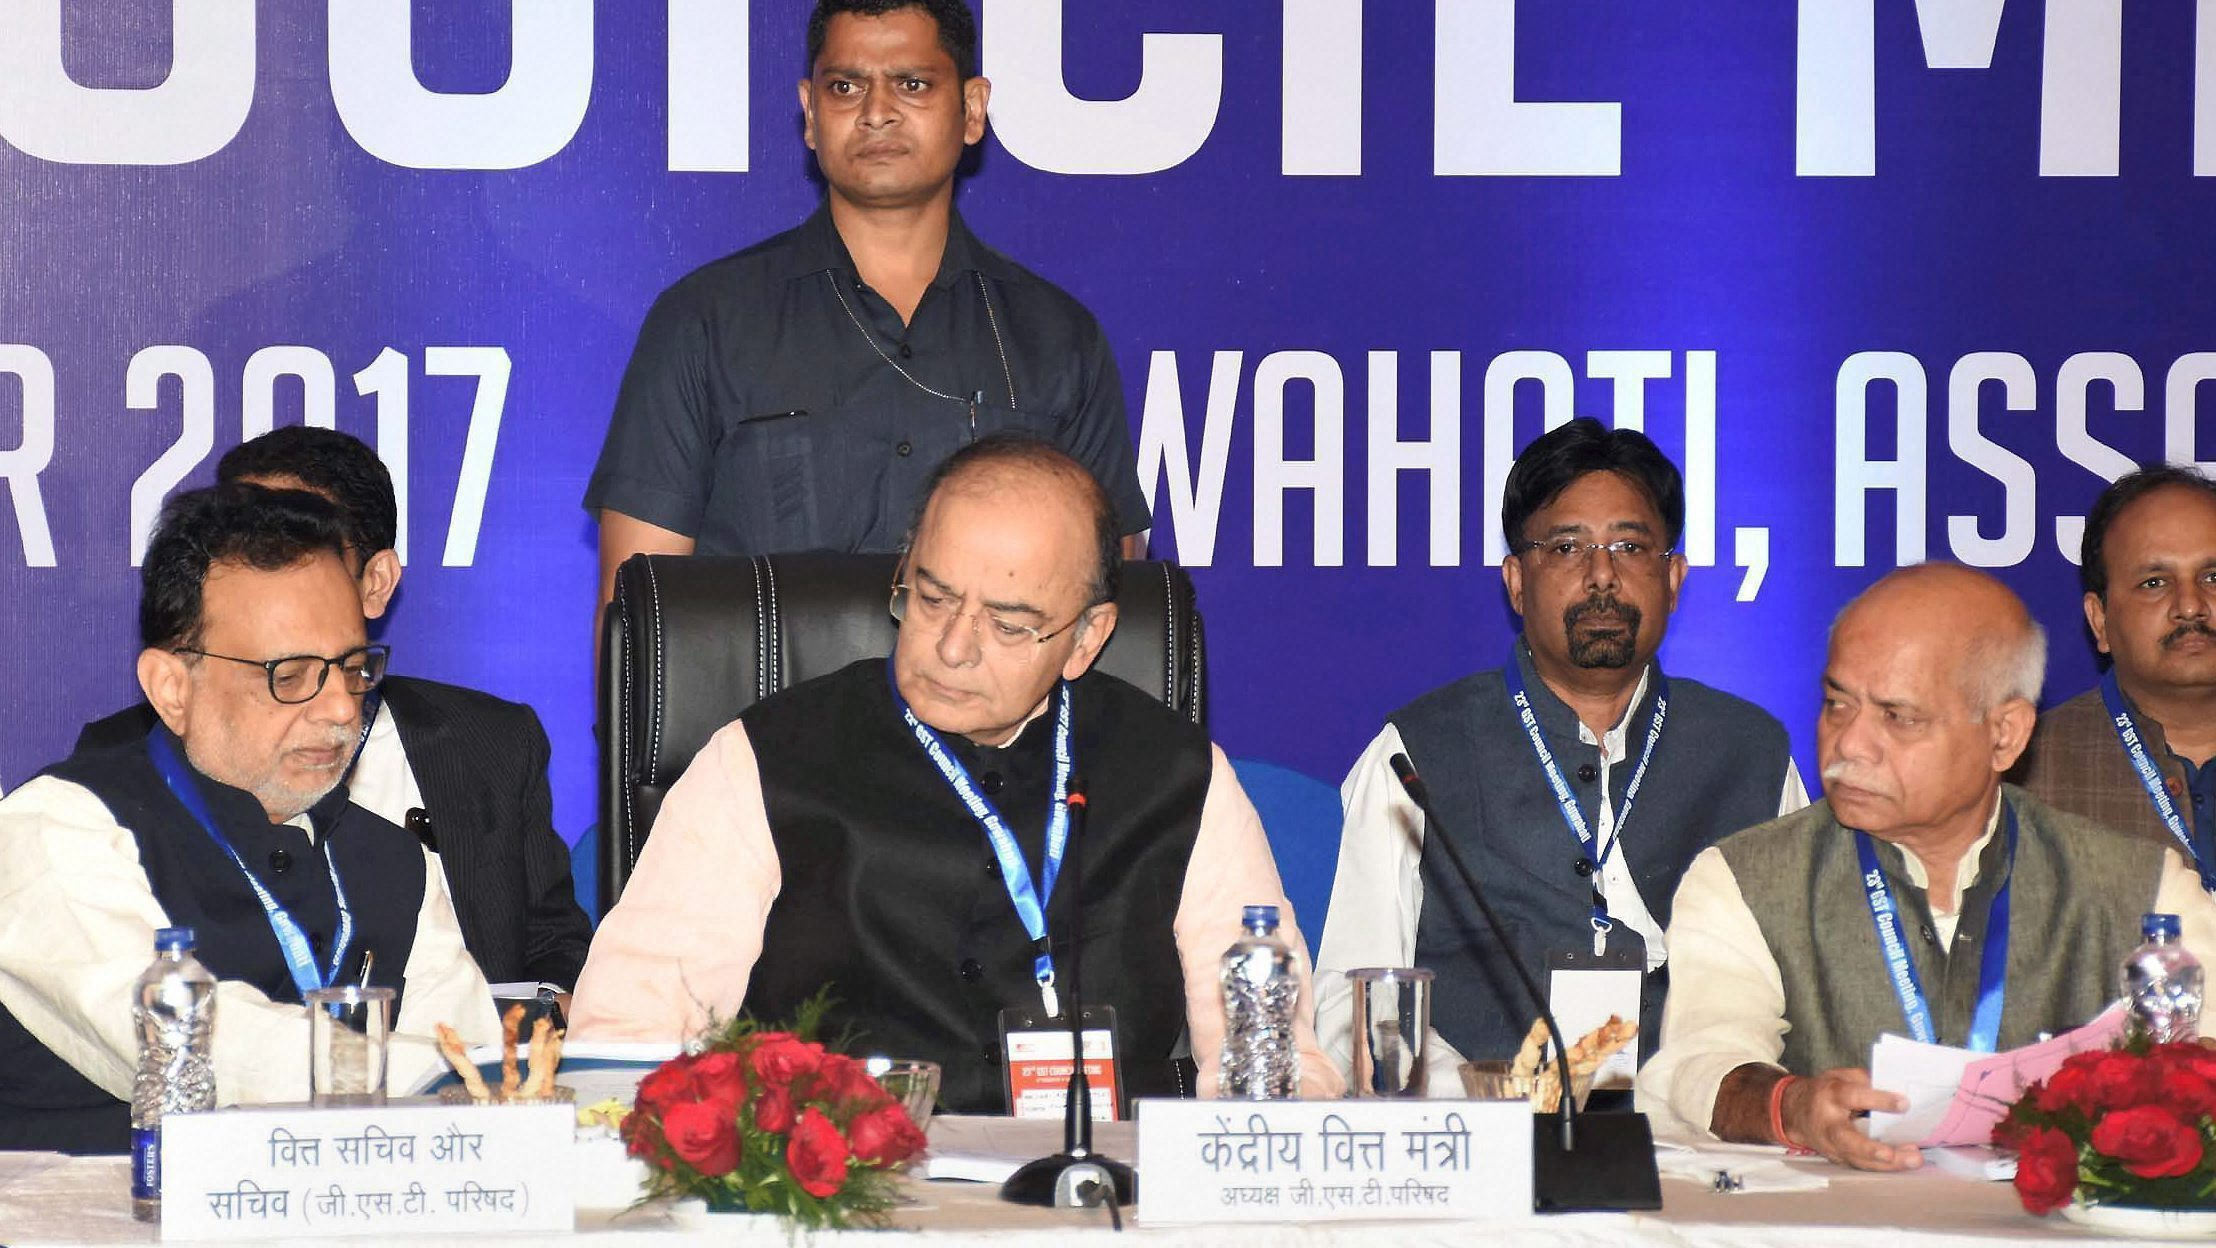 Guwahati: Union Finance Minister Arun Jaitley along with MoS for Finance Shiv Pratap Shukla and Finance Secretary Hasmukh Adhia (L) at the 23rd GST Council Meting, in Guwahati on Friday. PTI Photo(PTI11_10_2017_000047B)